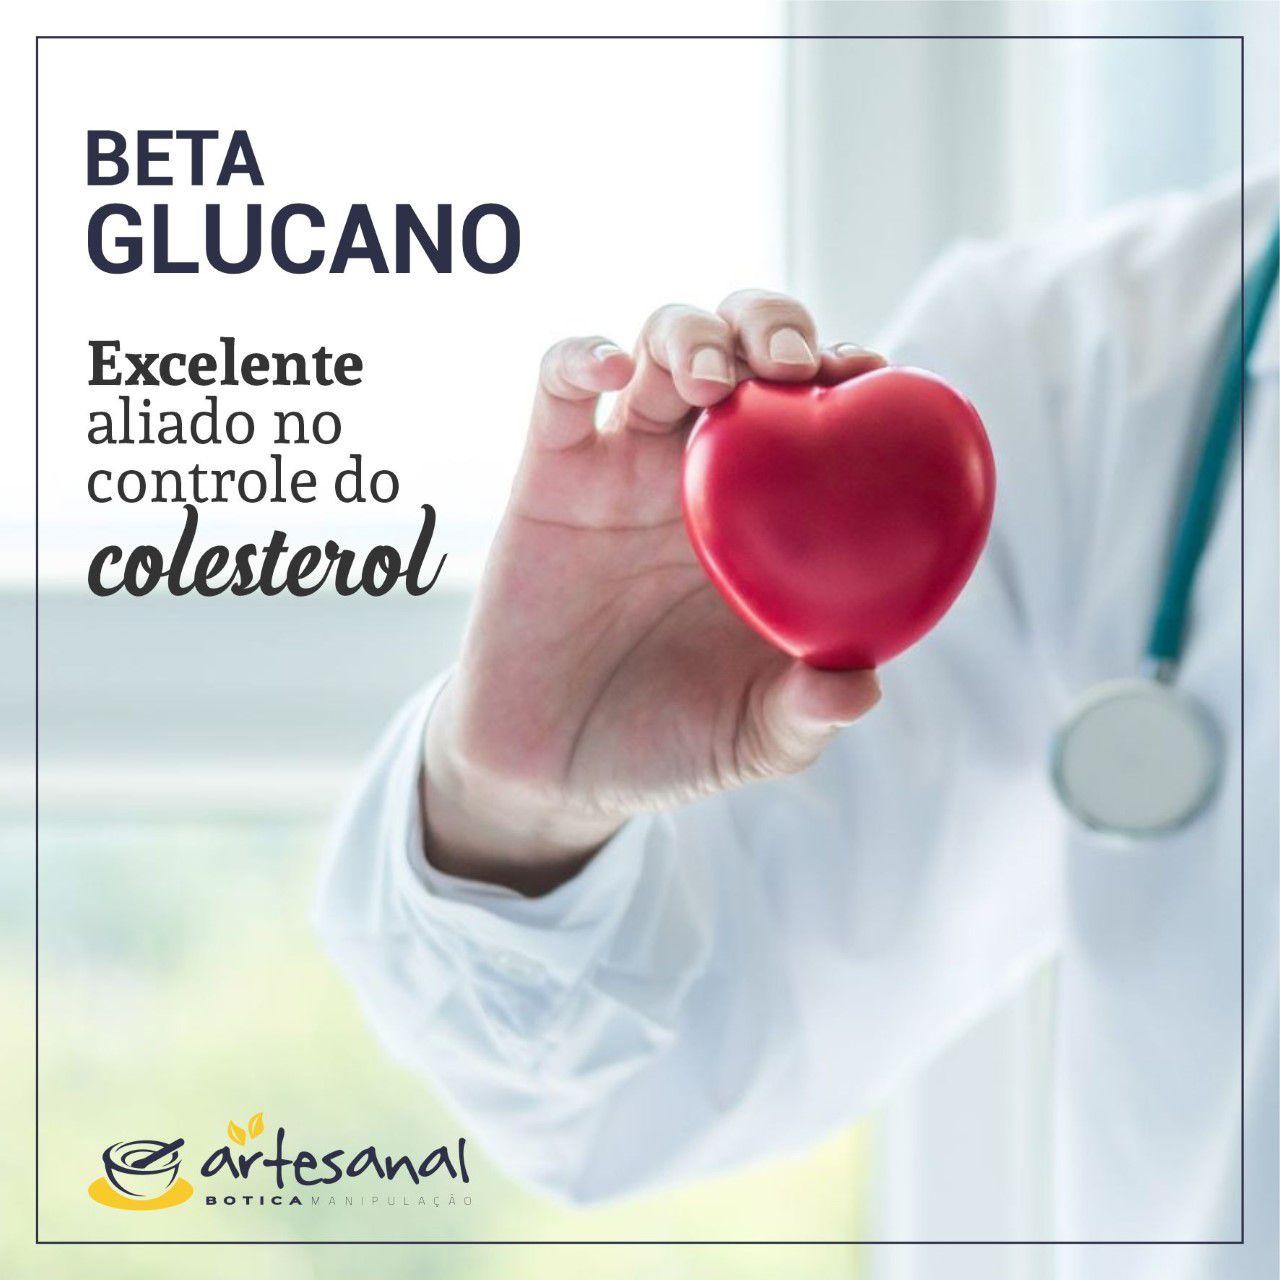 Beta Glucano 250mg - 30 Cps